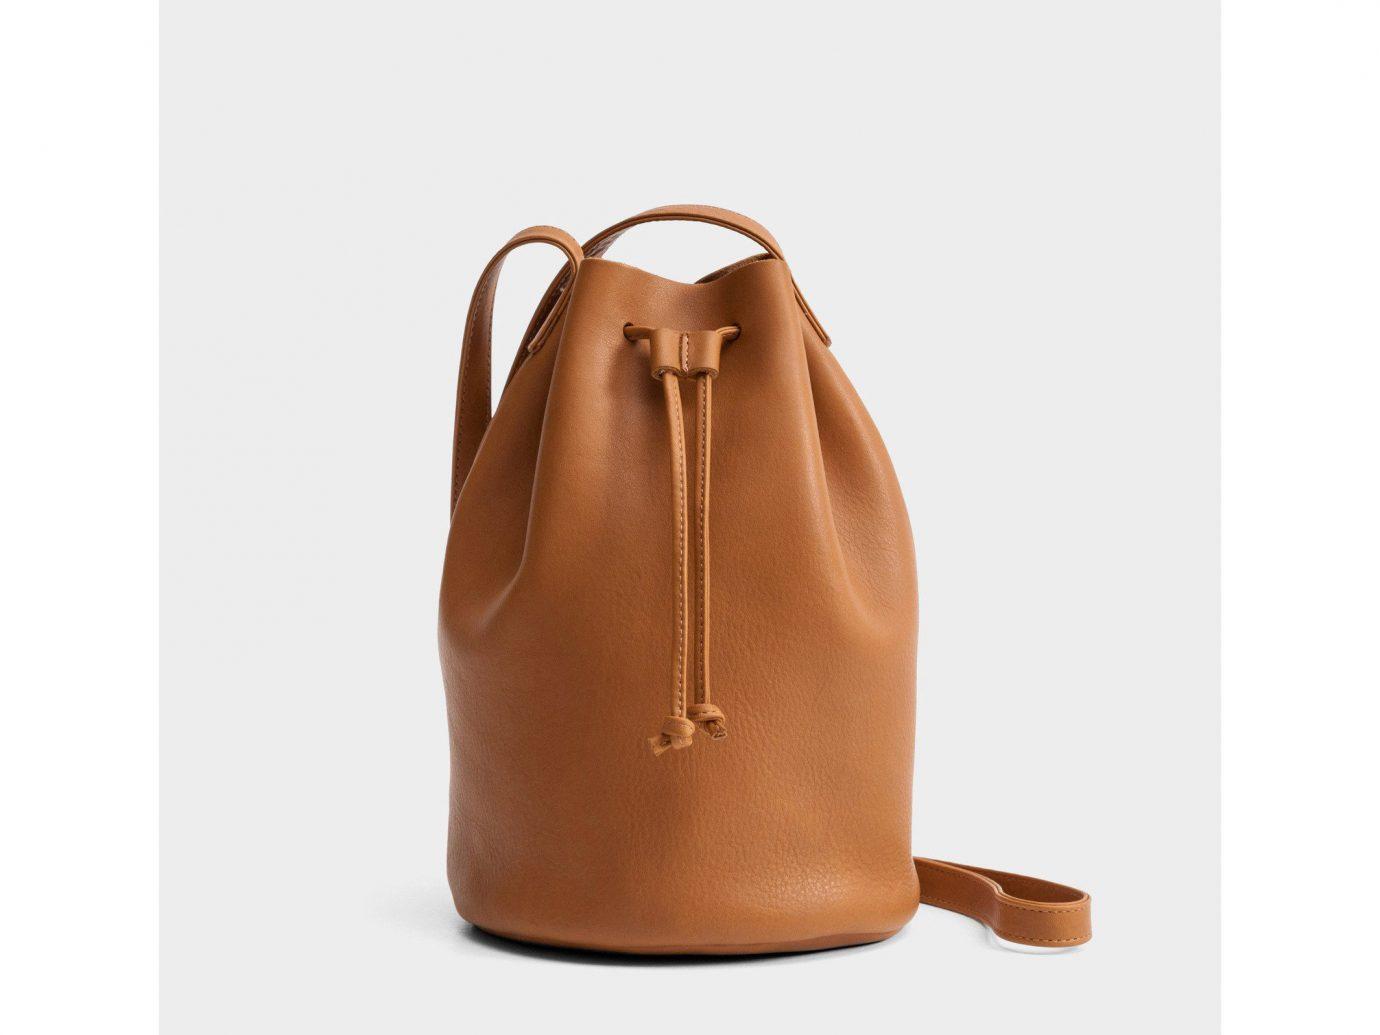 Style + Design brown bag product leather handbag caramel color product design